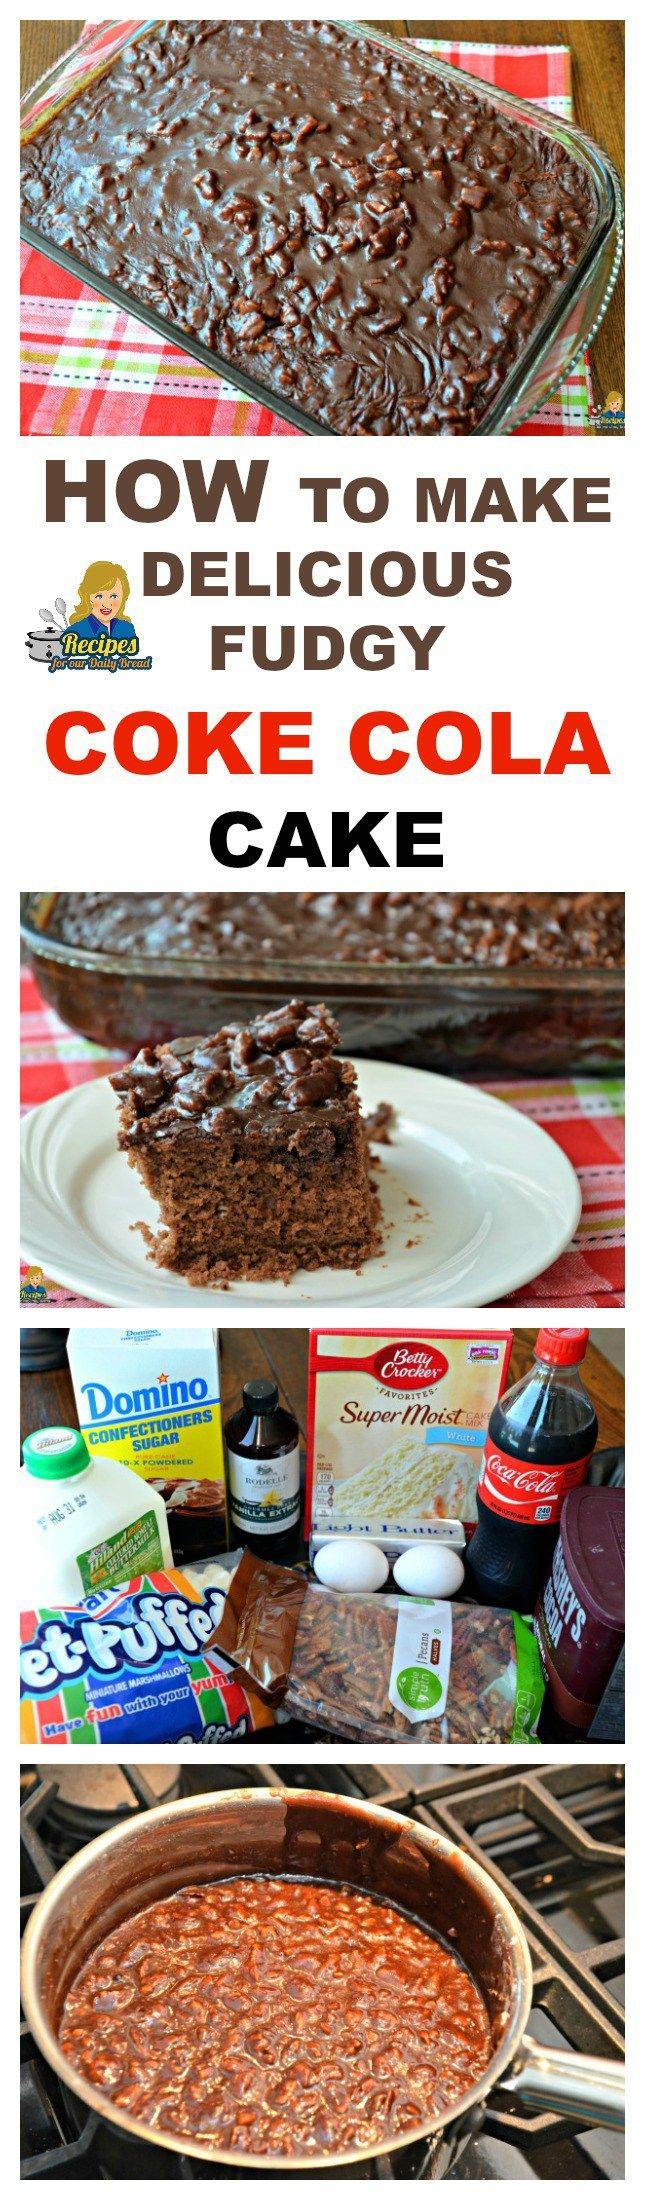 HOW TO MAKE DELICIOUS SOUTHERN FUDGY COCA-COLA CAKE PRINT RECIPE HERE: http://recipesforourdailybread.com/fudgy-coca-cola-cake/